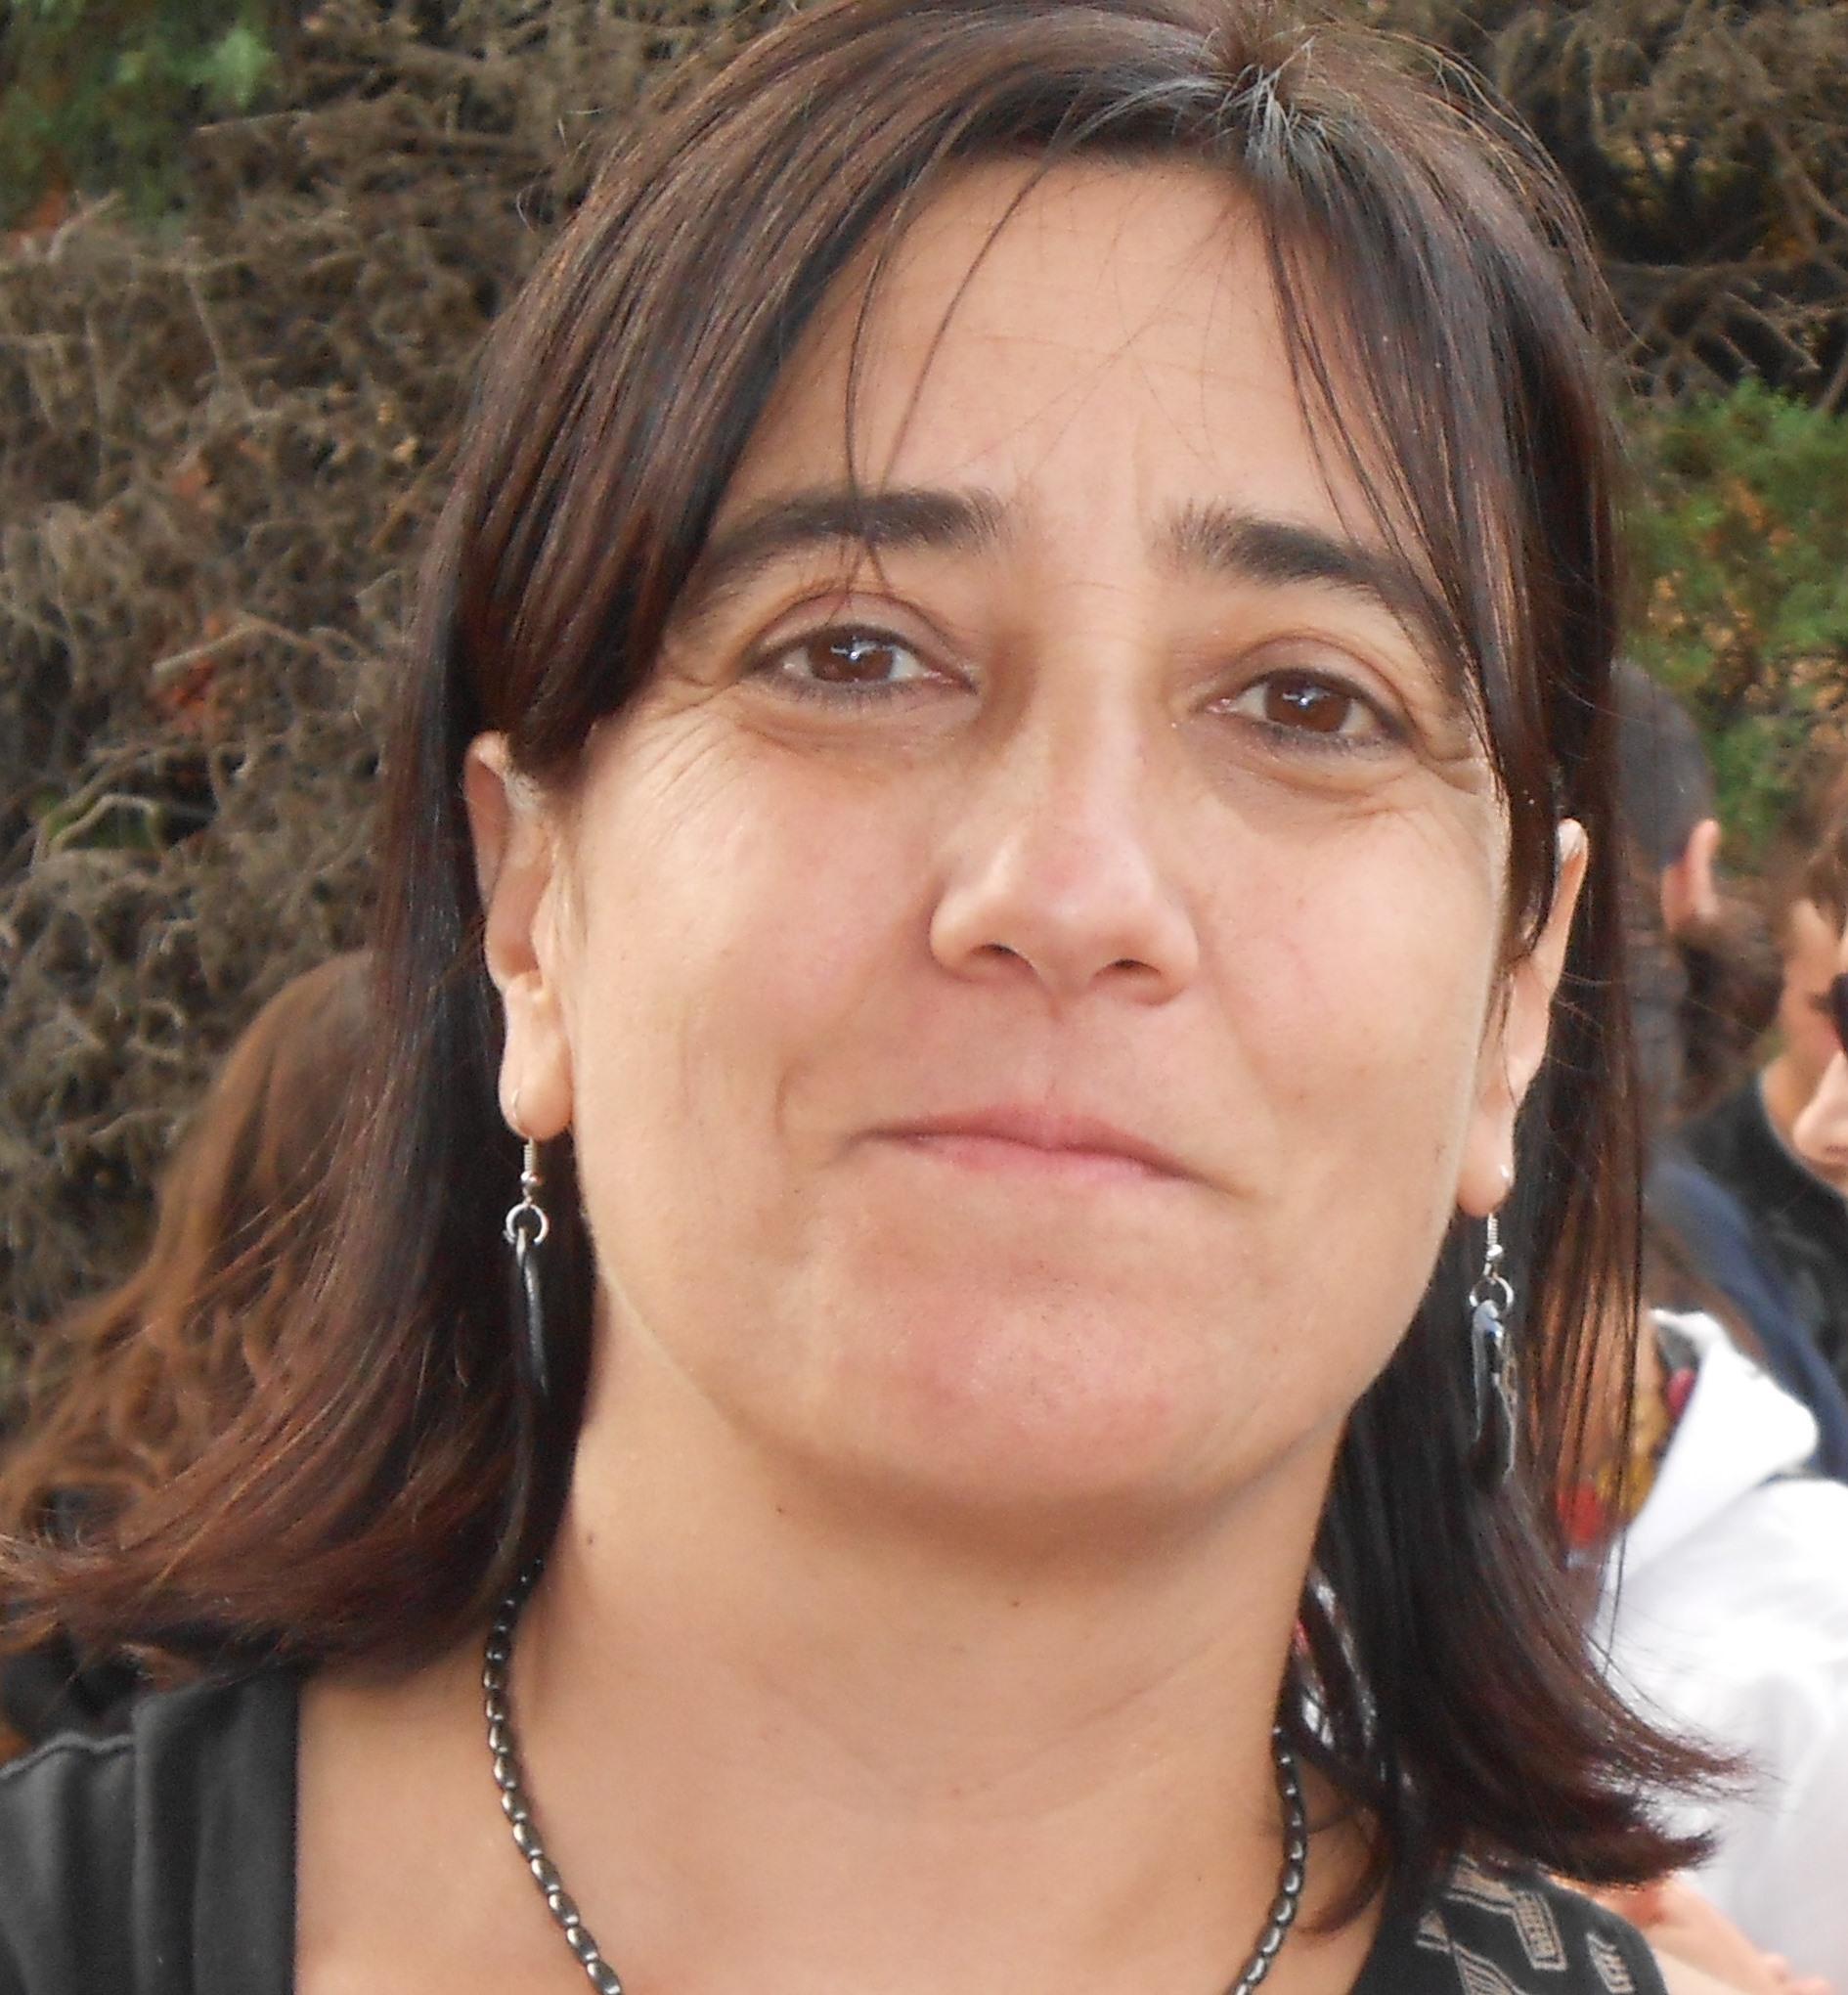 Carme Montserrat, Professor, University of Girona, Spain